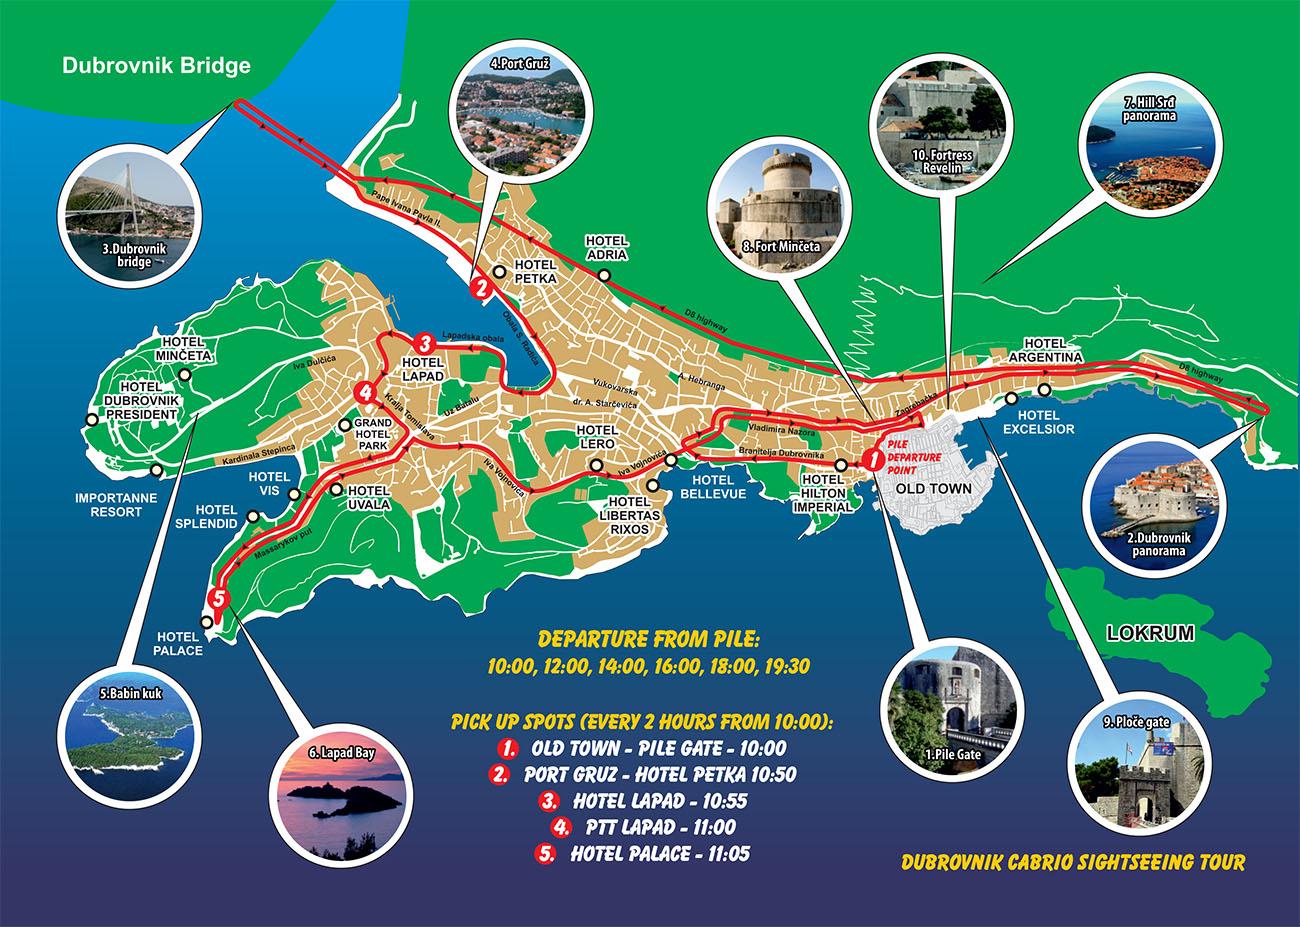 Sightseeing Dubrovnik - Cabrio bus tour Dubrovnik on